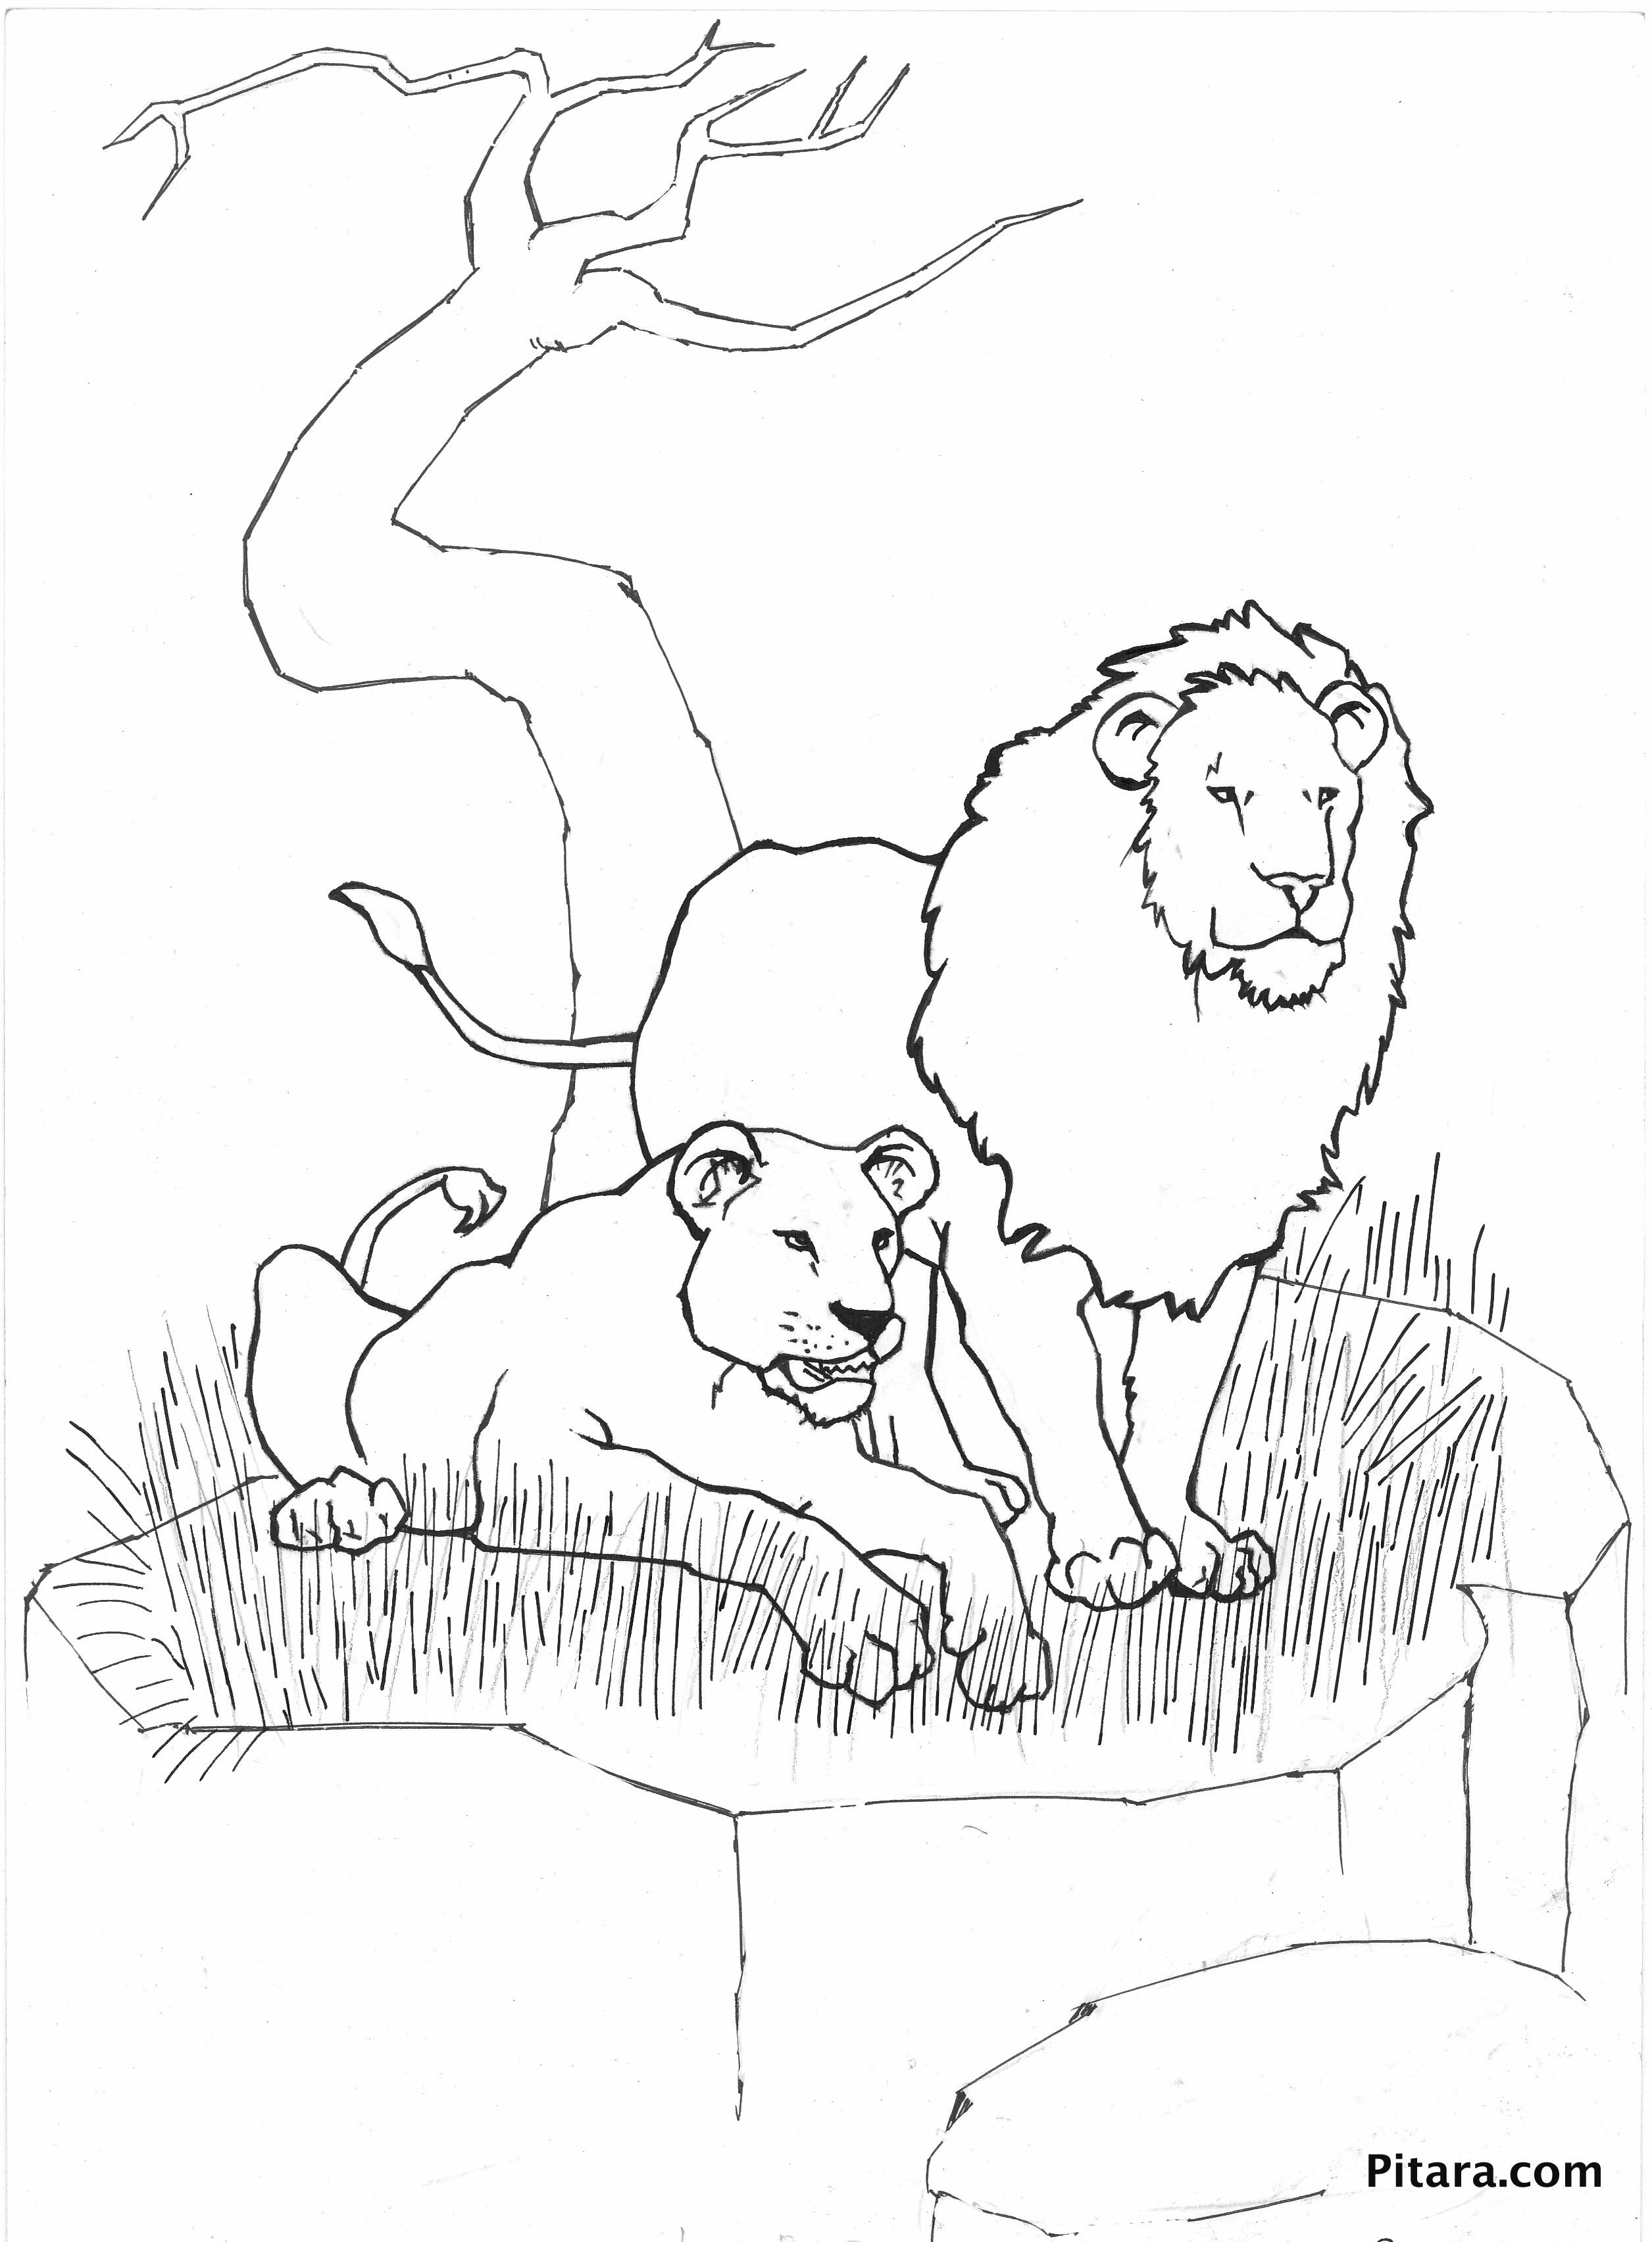 Wild Animals Coloring Pages – Pitara Kids Network